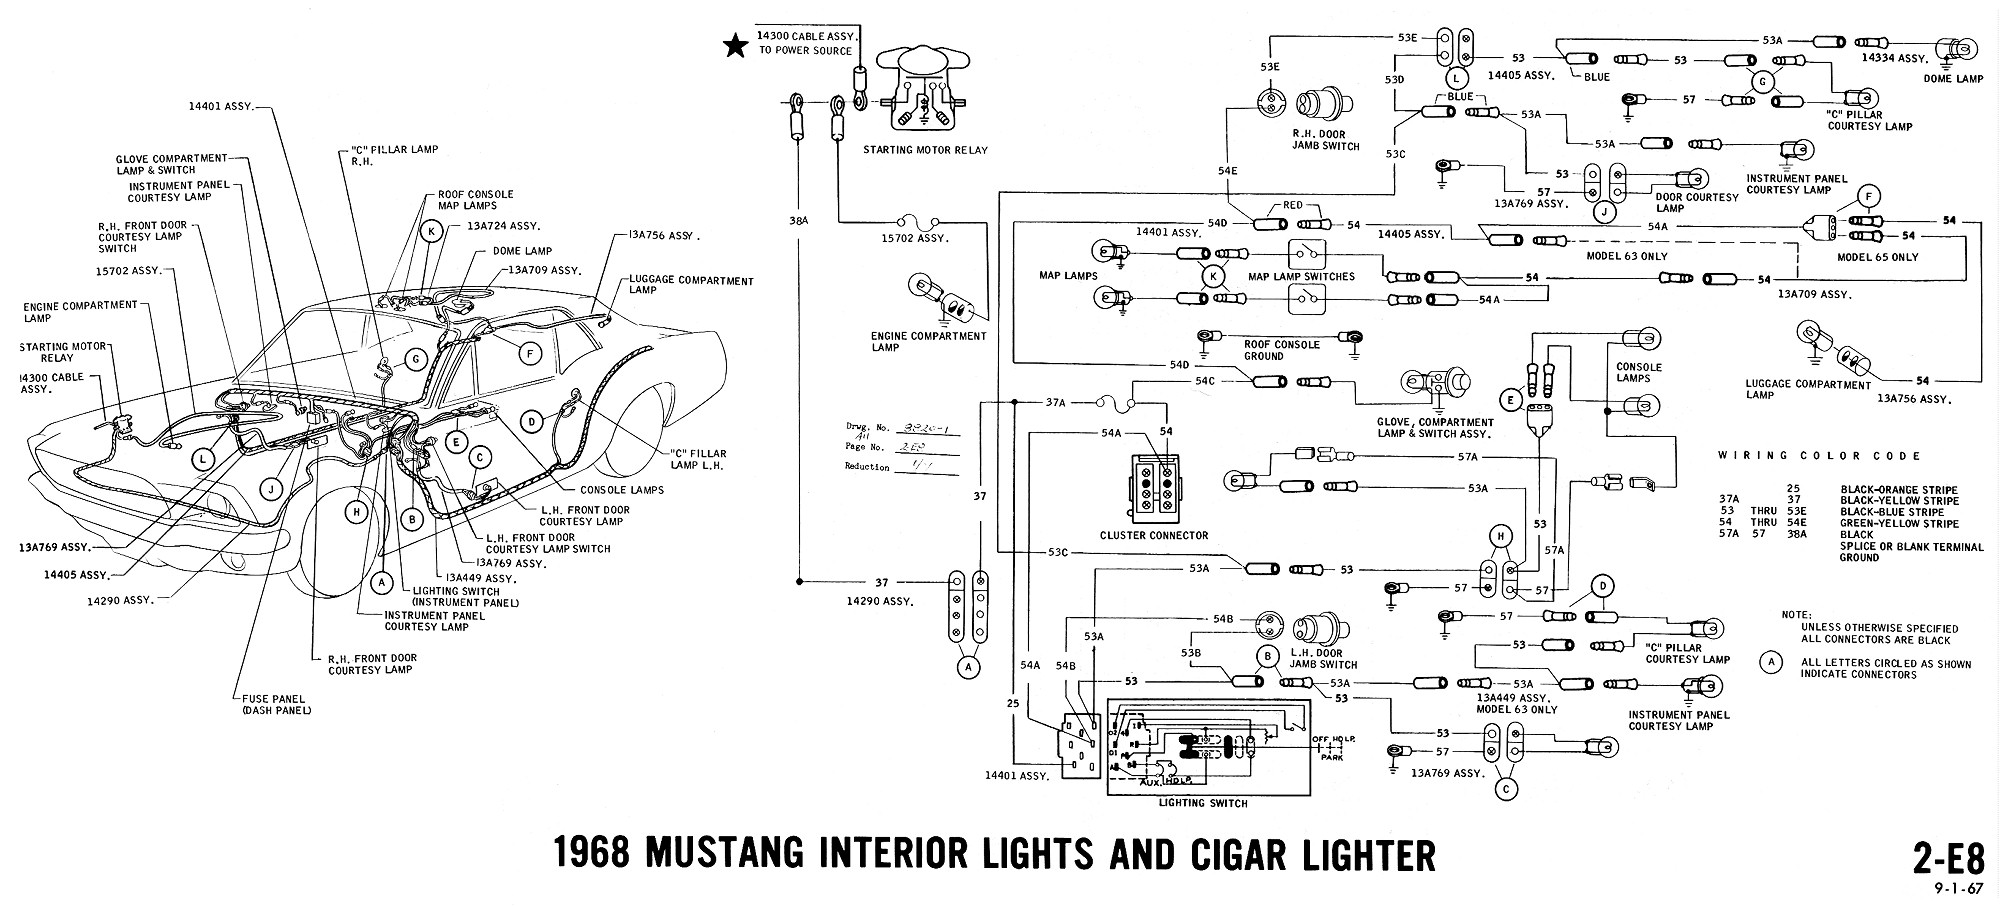 1968 mustang wiring diagrams evolving software 68 mustang turn signal wiring diagram master wiring diagram 68 mustang fuse diagrams #1